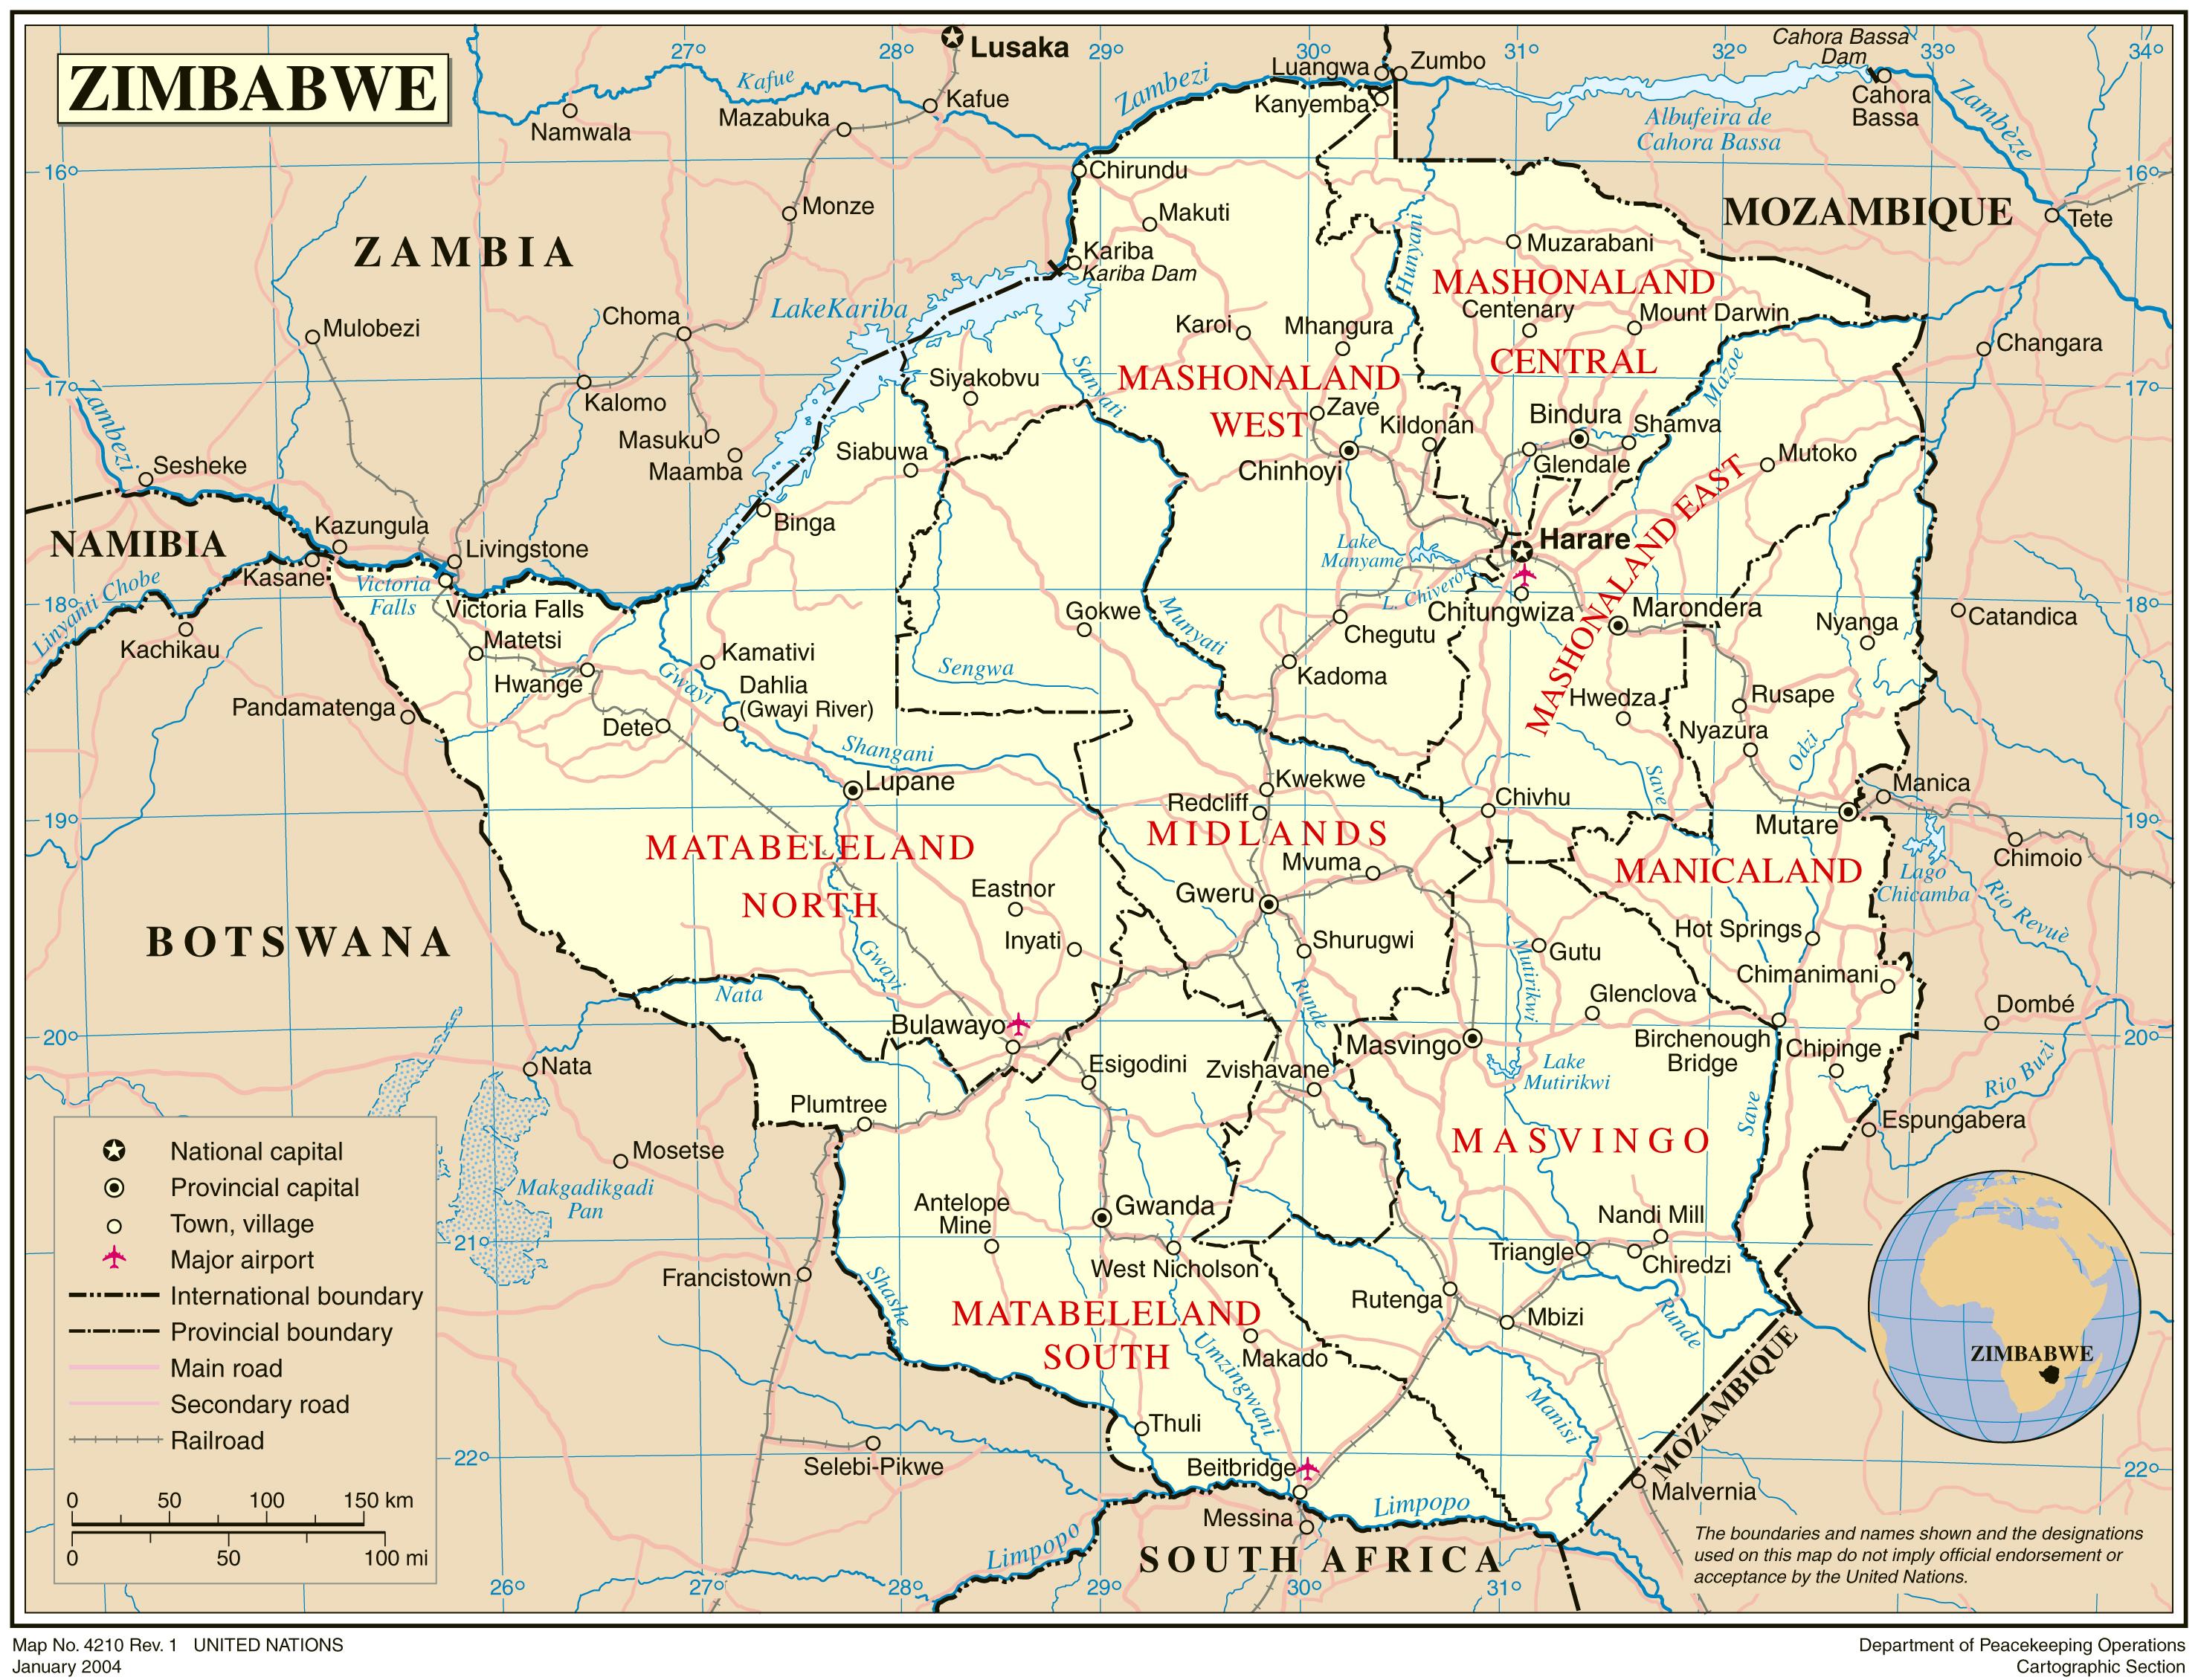 eritrea map, prussia map, algeria map, harare map, mozambique map, rhodesia map, lesotho map, senegal map, tunisia map, israel map, united nations map, zambia map, kenya map, madagascar map, liberia map, world map, ethiopia map, tanzania map, niger map, uganda map, sudan map, angola map, malawi map, mali map, africa map, cameroon map, kosovo map, albania map, ghana map, libya map, namibia map, victoria falls map, uzbekistan map, morocco map, luxembourg map, rwanda map, on zimbabwe map